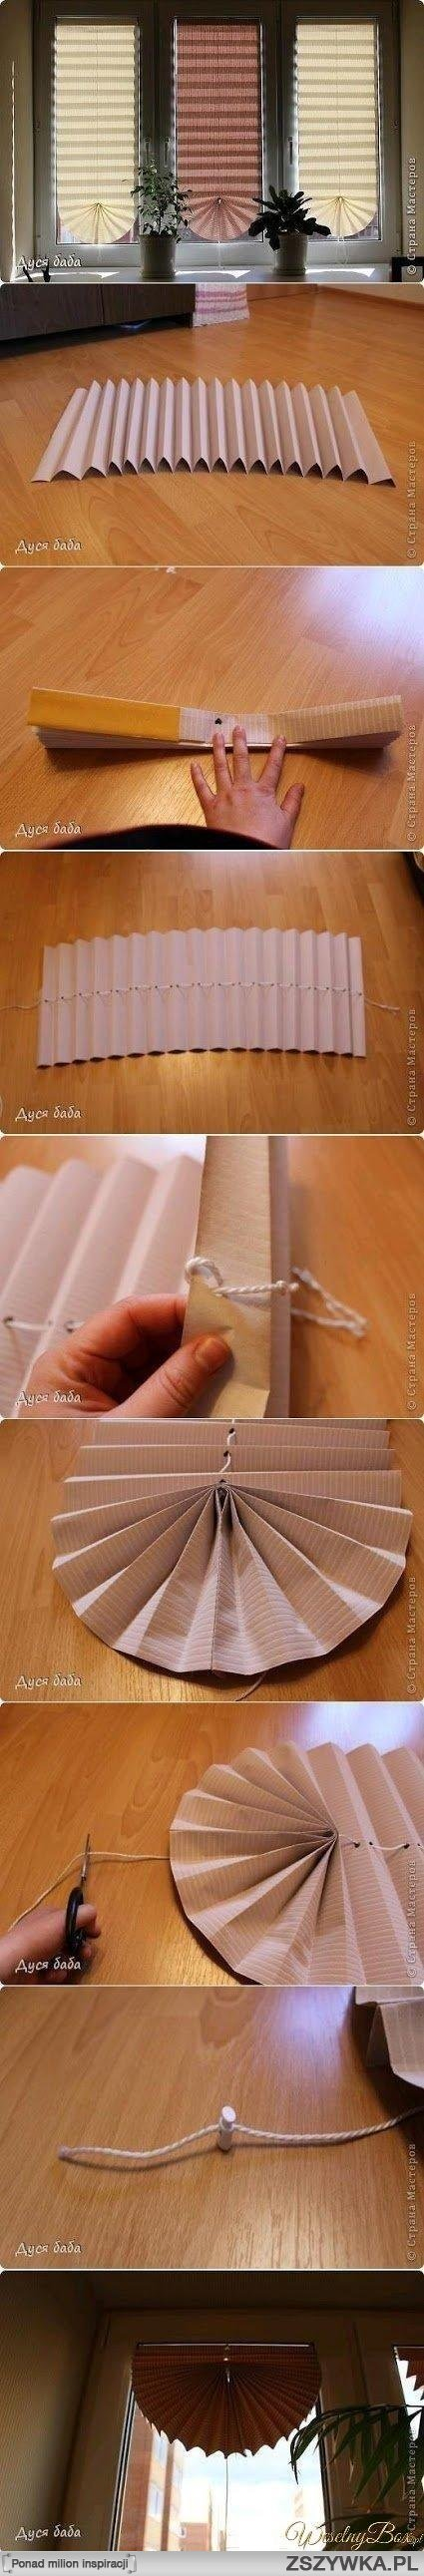 Diy draw curtain crafts pinterest craft ideas and crafts